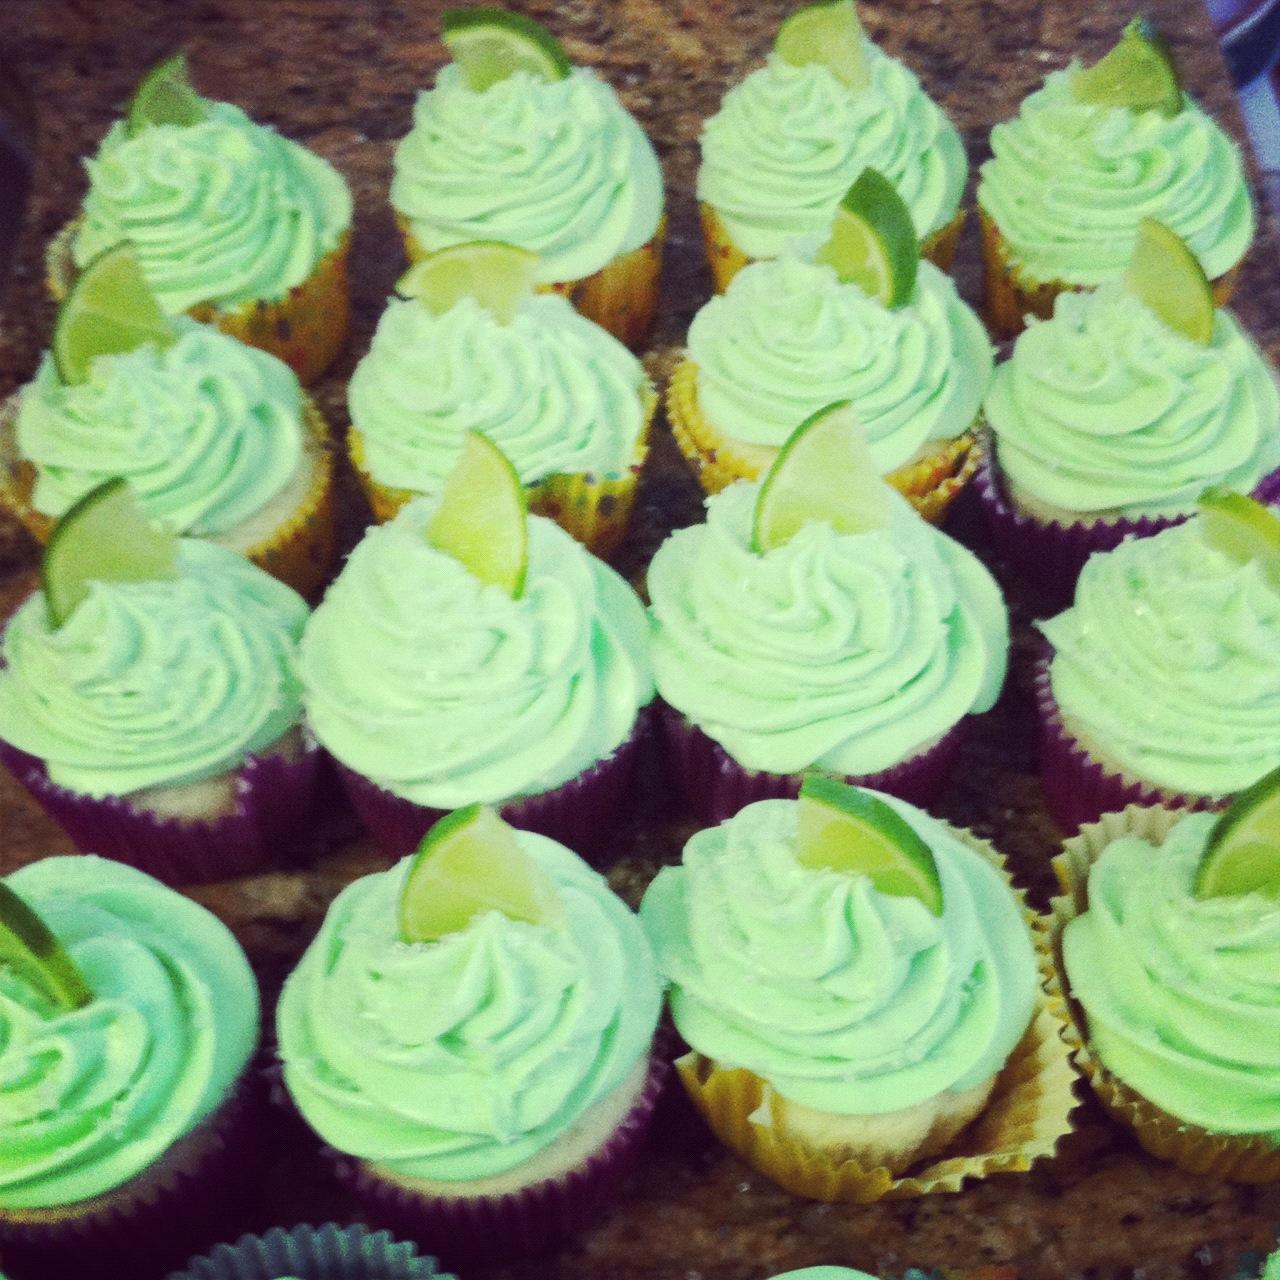 Tequila Shot Cupcakes | ButterLustBlog.com